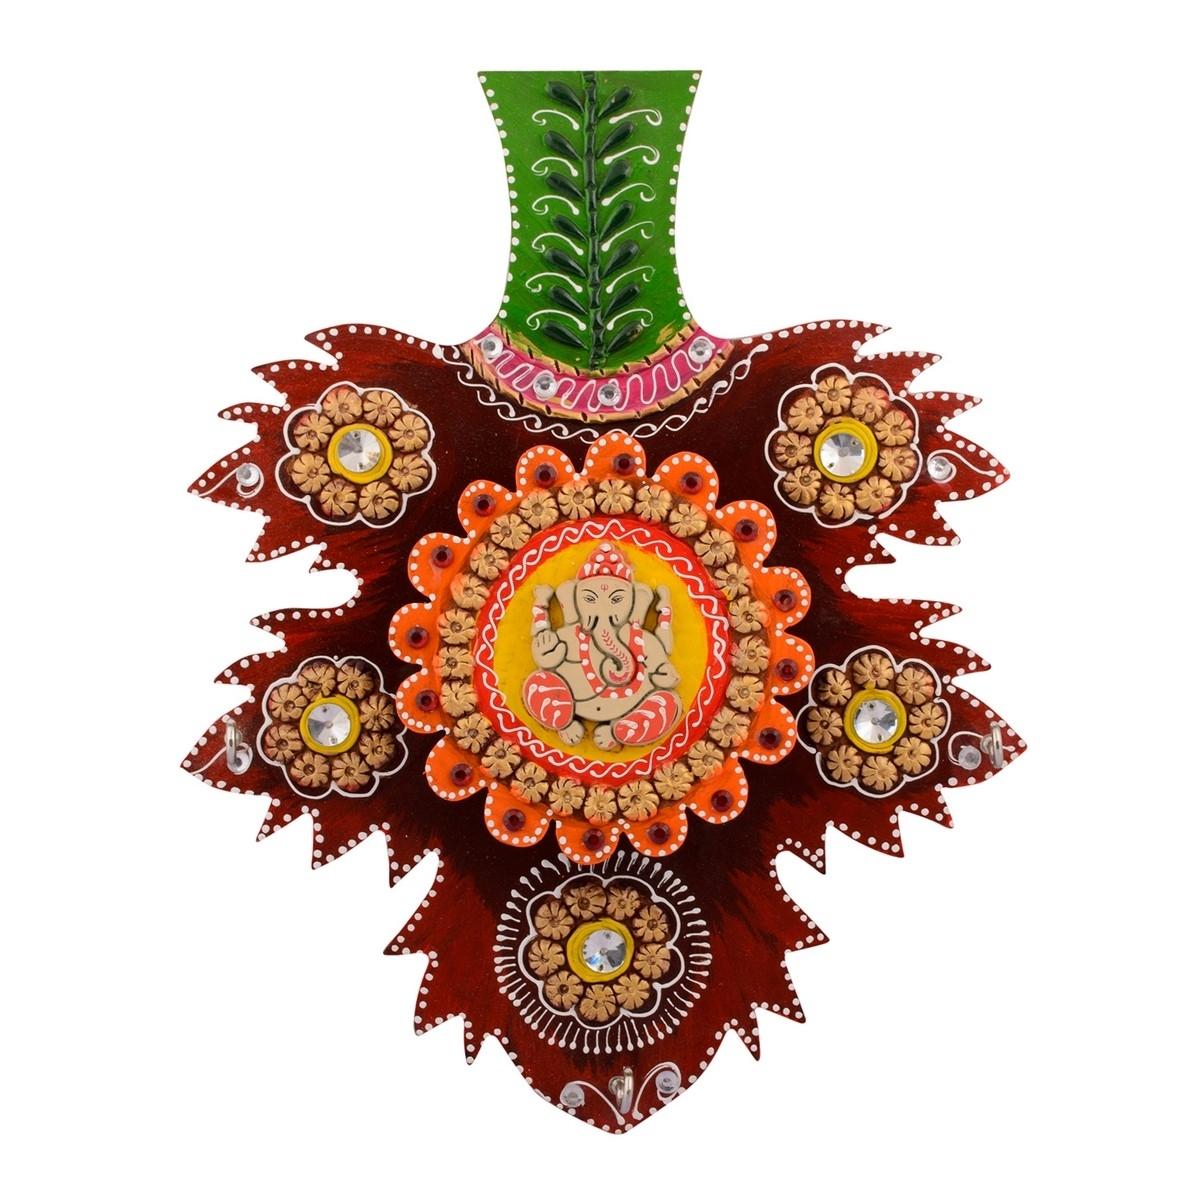 Wooden Papier Mache Decorative Lord Ganesha Key Holder Indian Home Decor